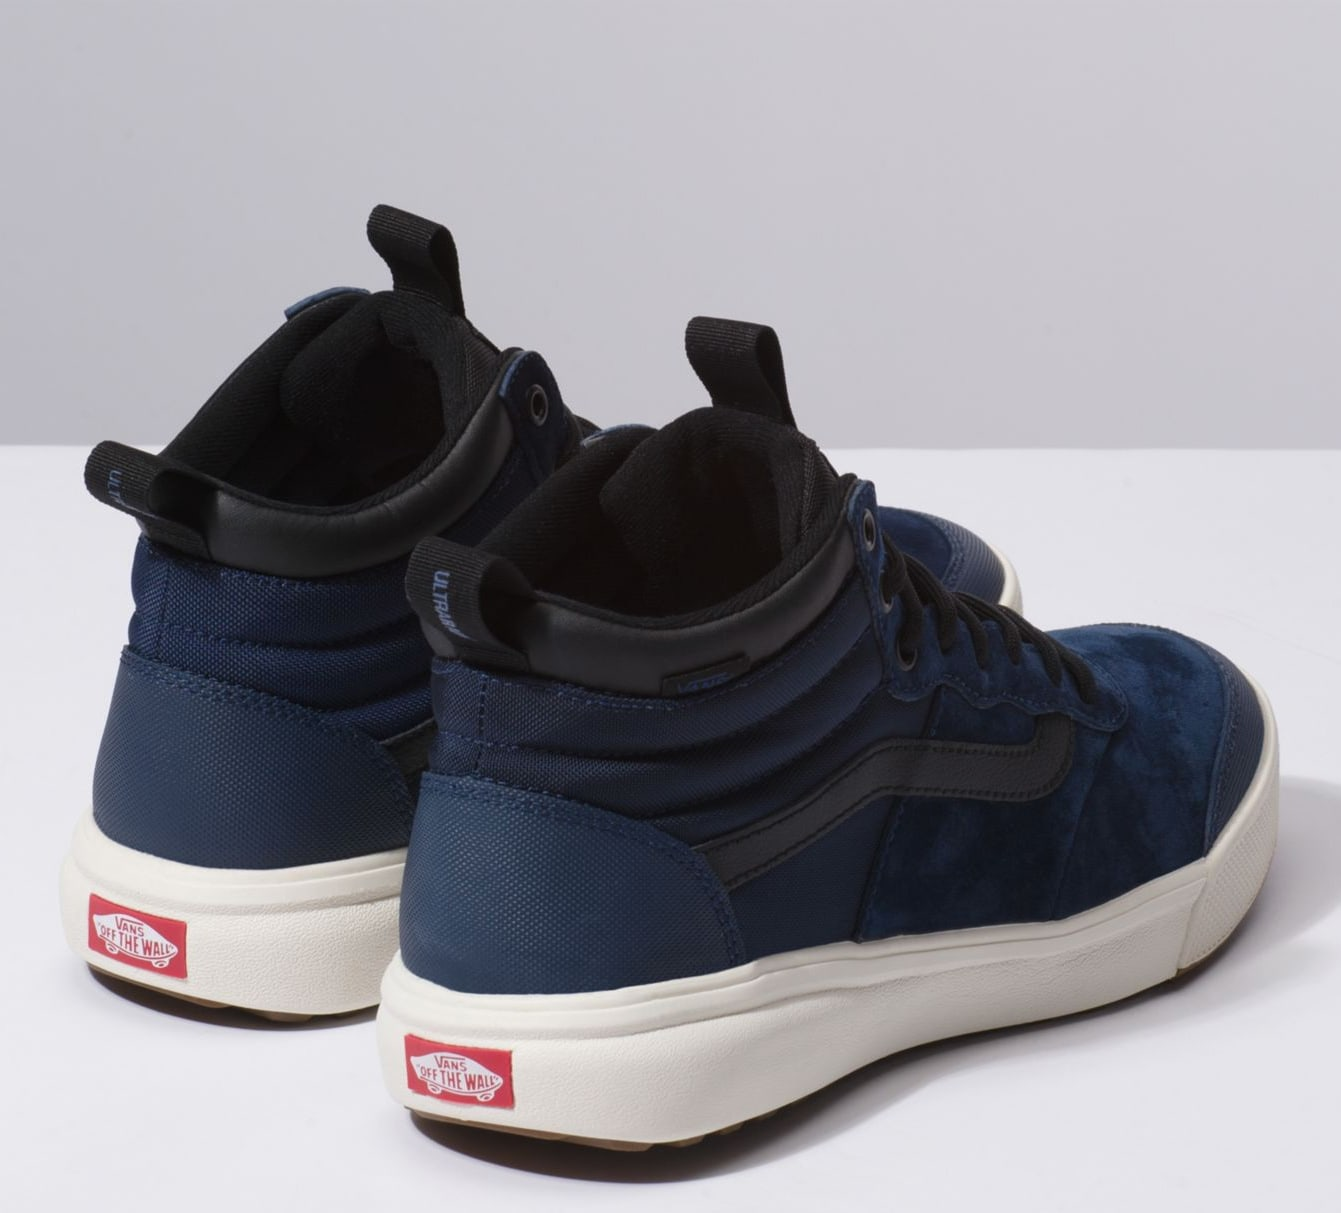 Vans Ultrarange Hi Mte Shoes